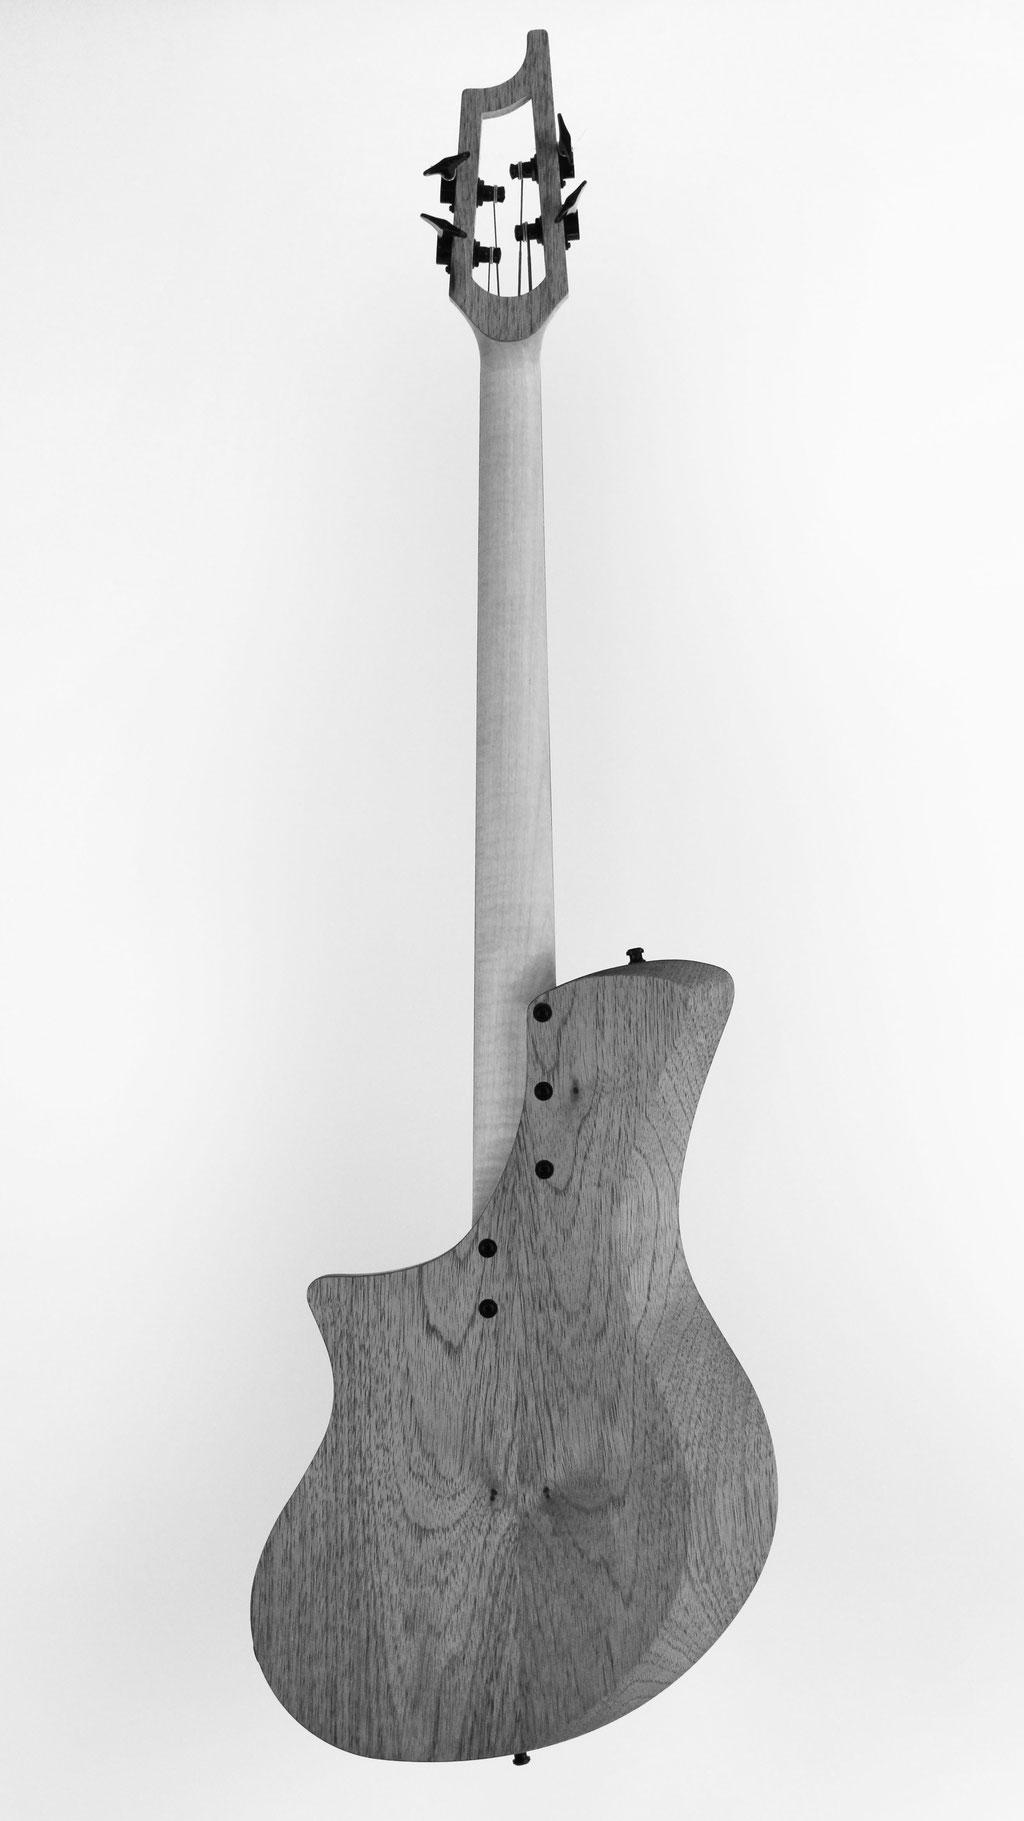 Singlecut Boutique e-bass high end instrumente kaufen - Bassguitar 5 String Design